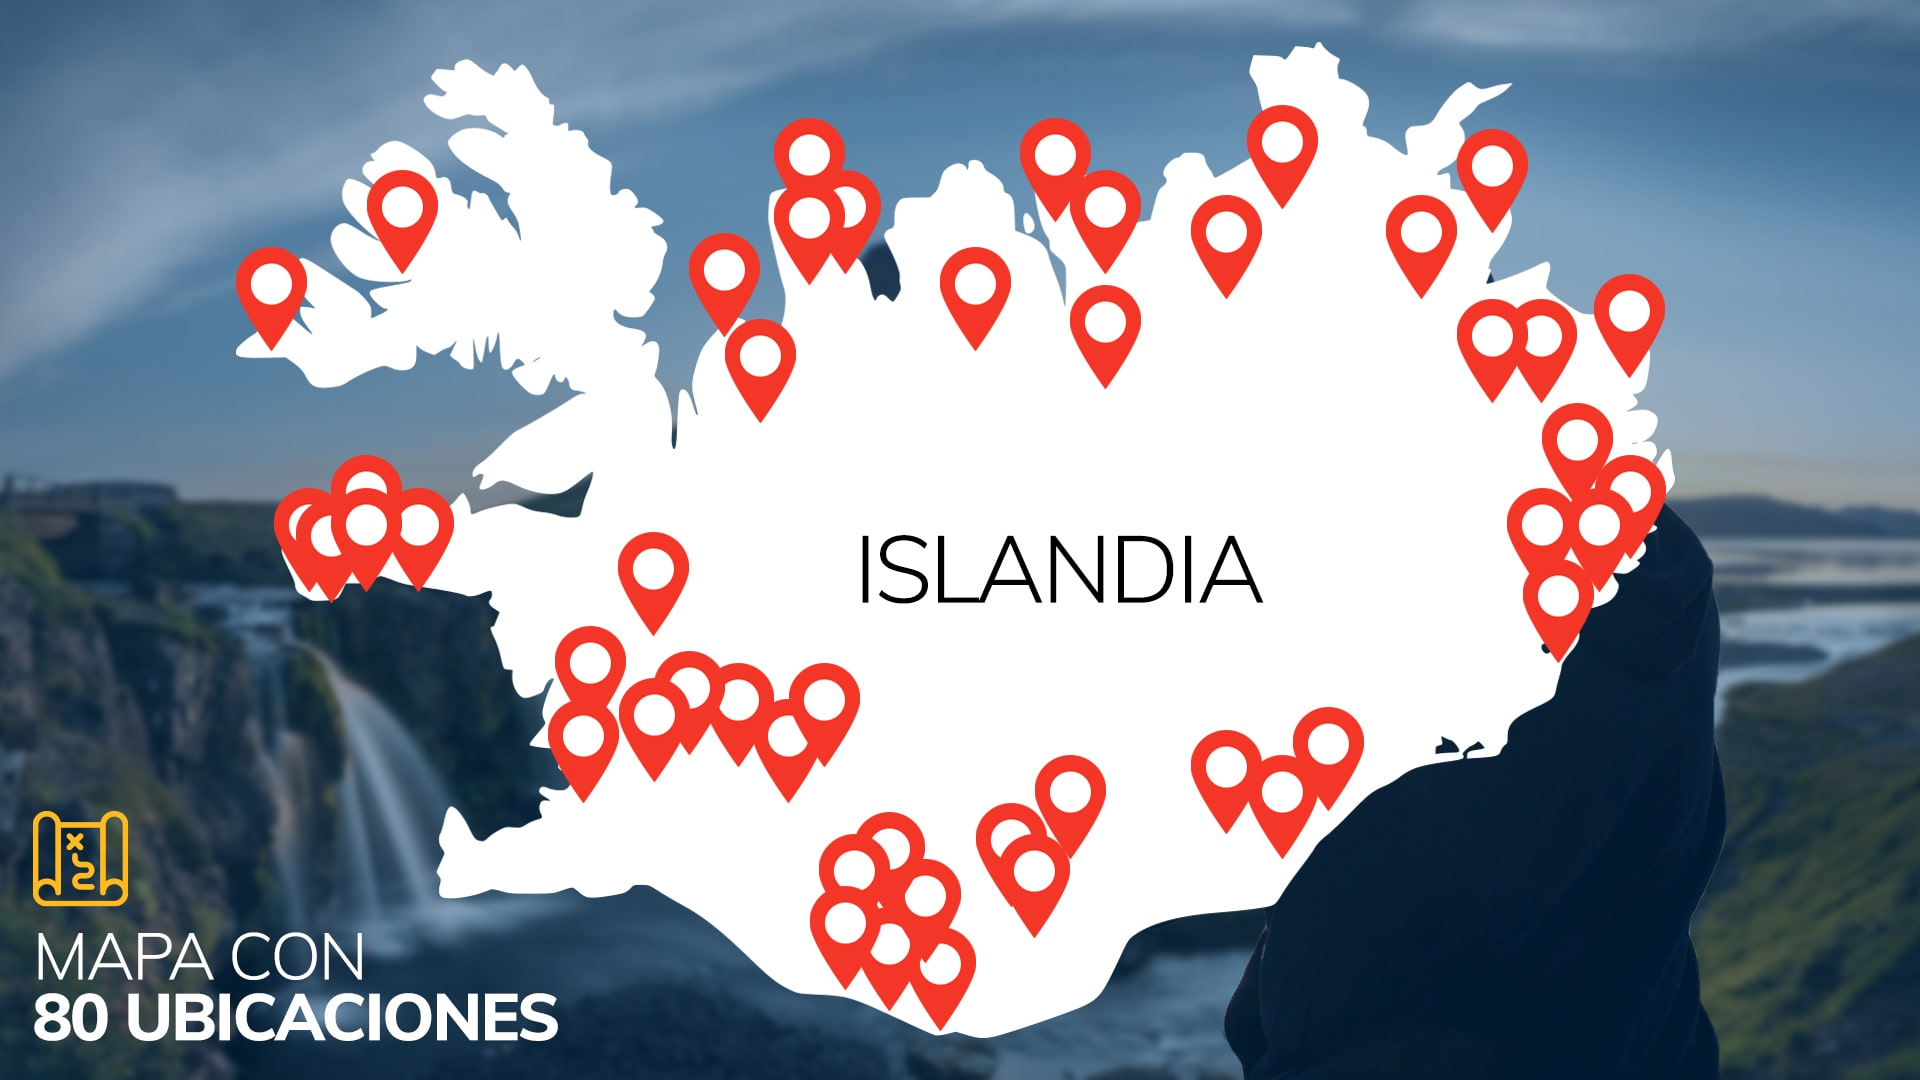 MAPA ISLANDIA geolocalizado